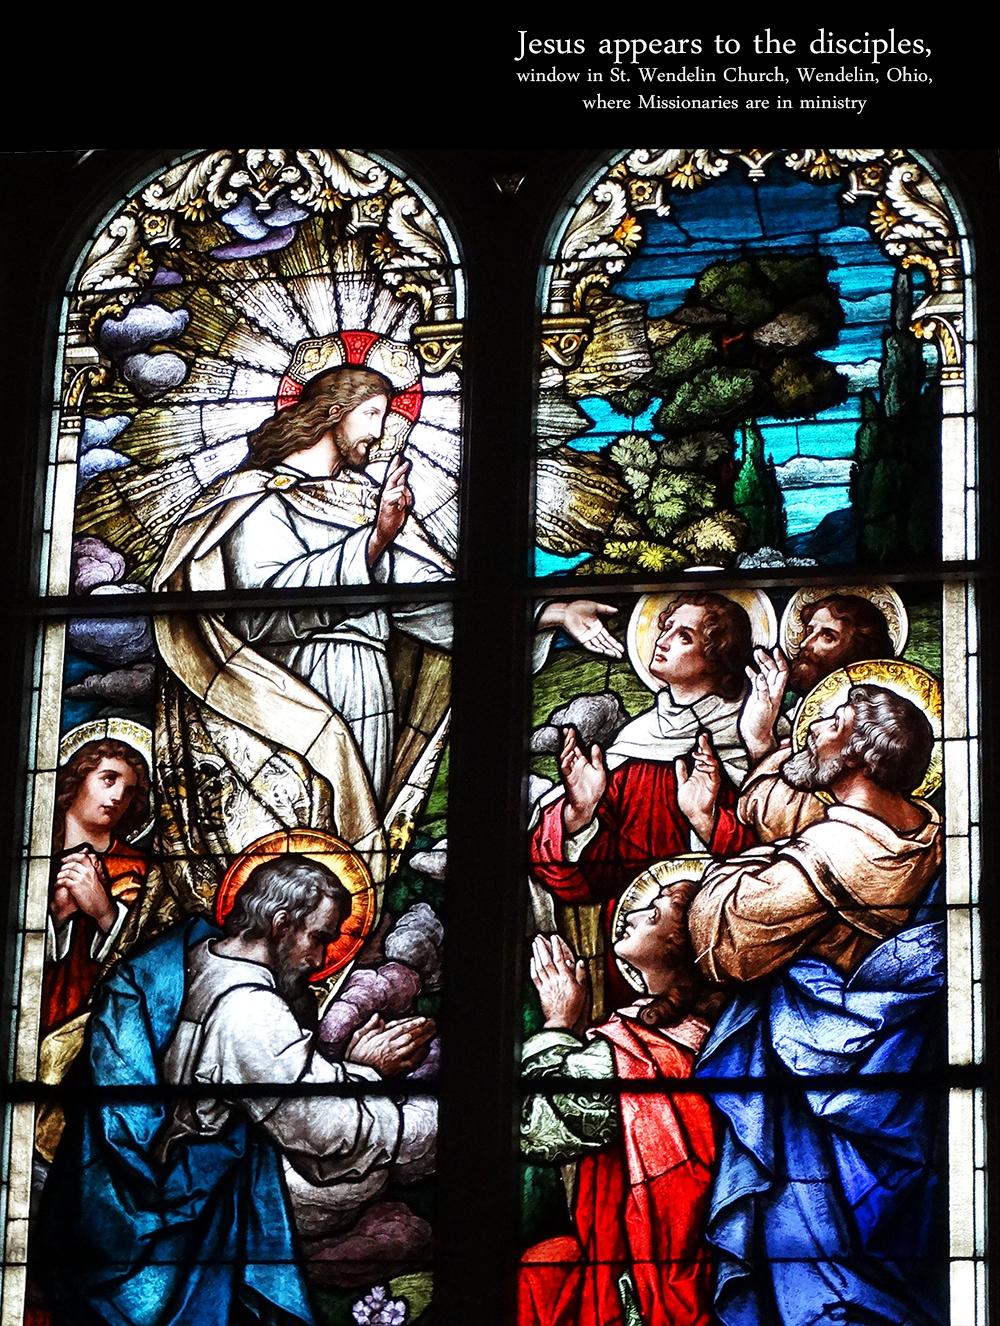 Easter Joy Streaming